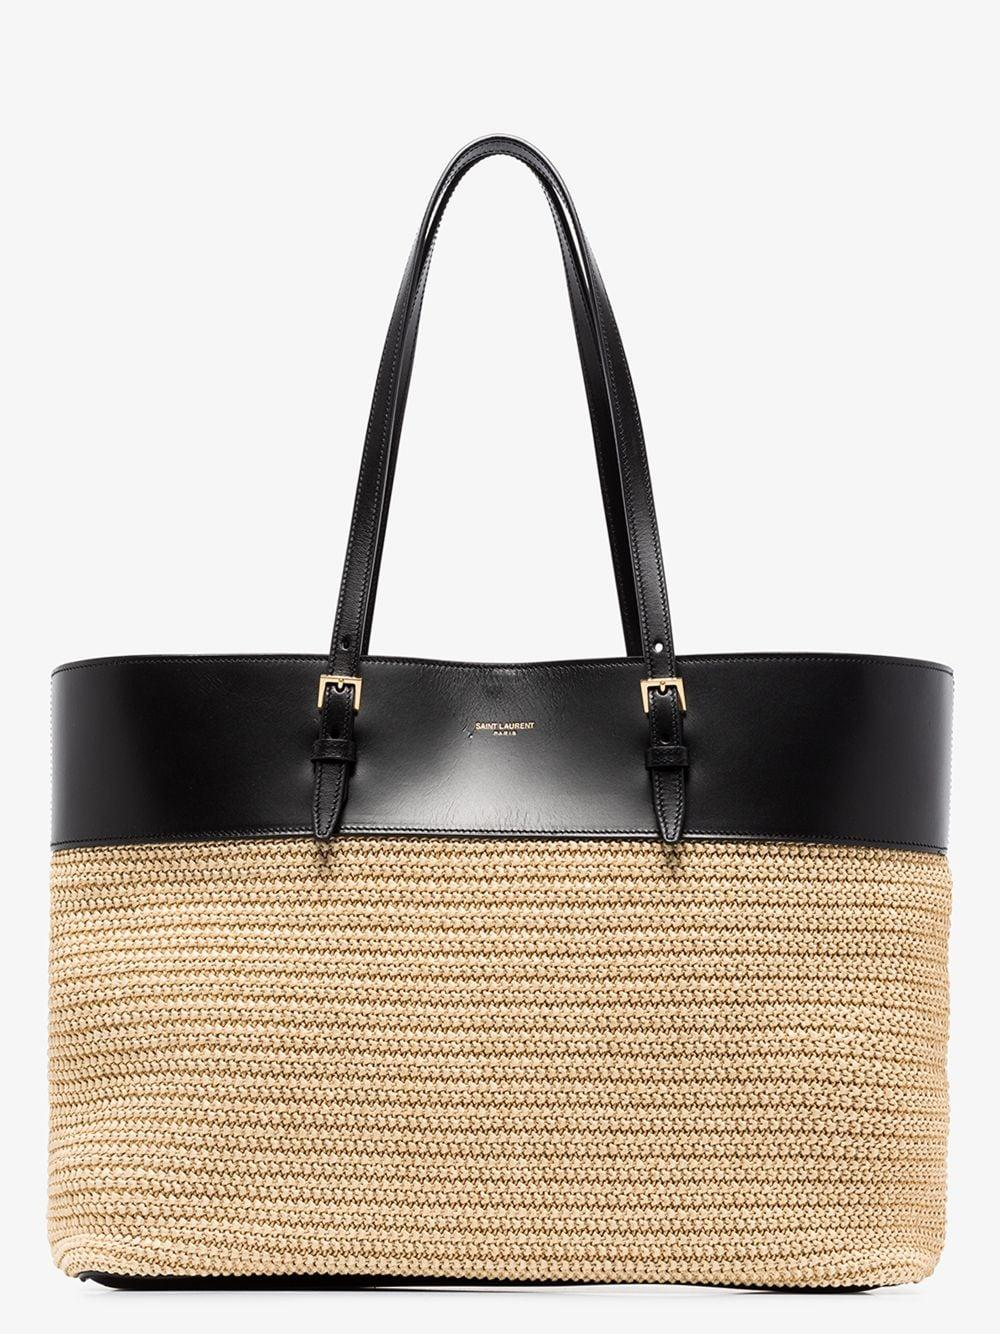 Boucle Rafia And Leather Shopping Bag